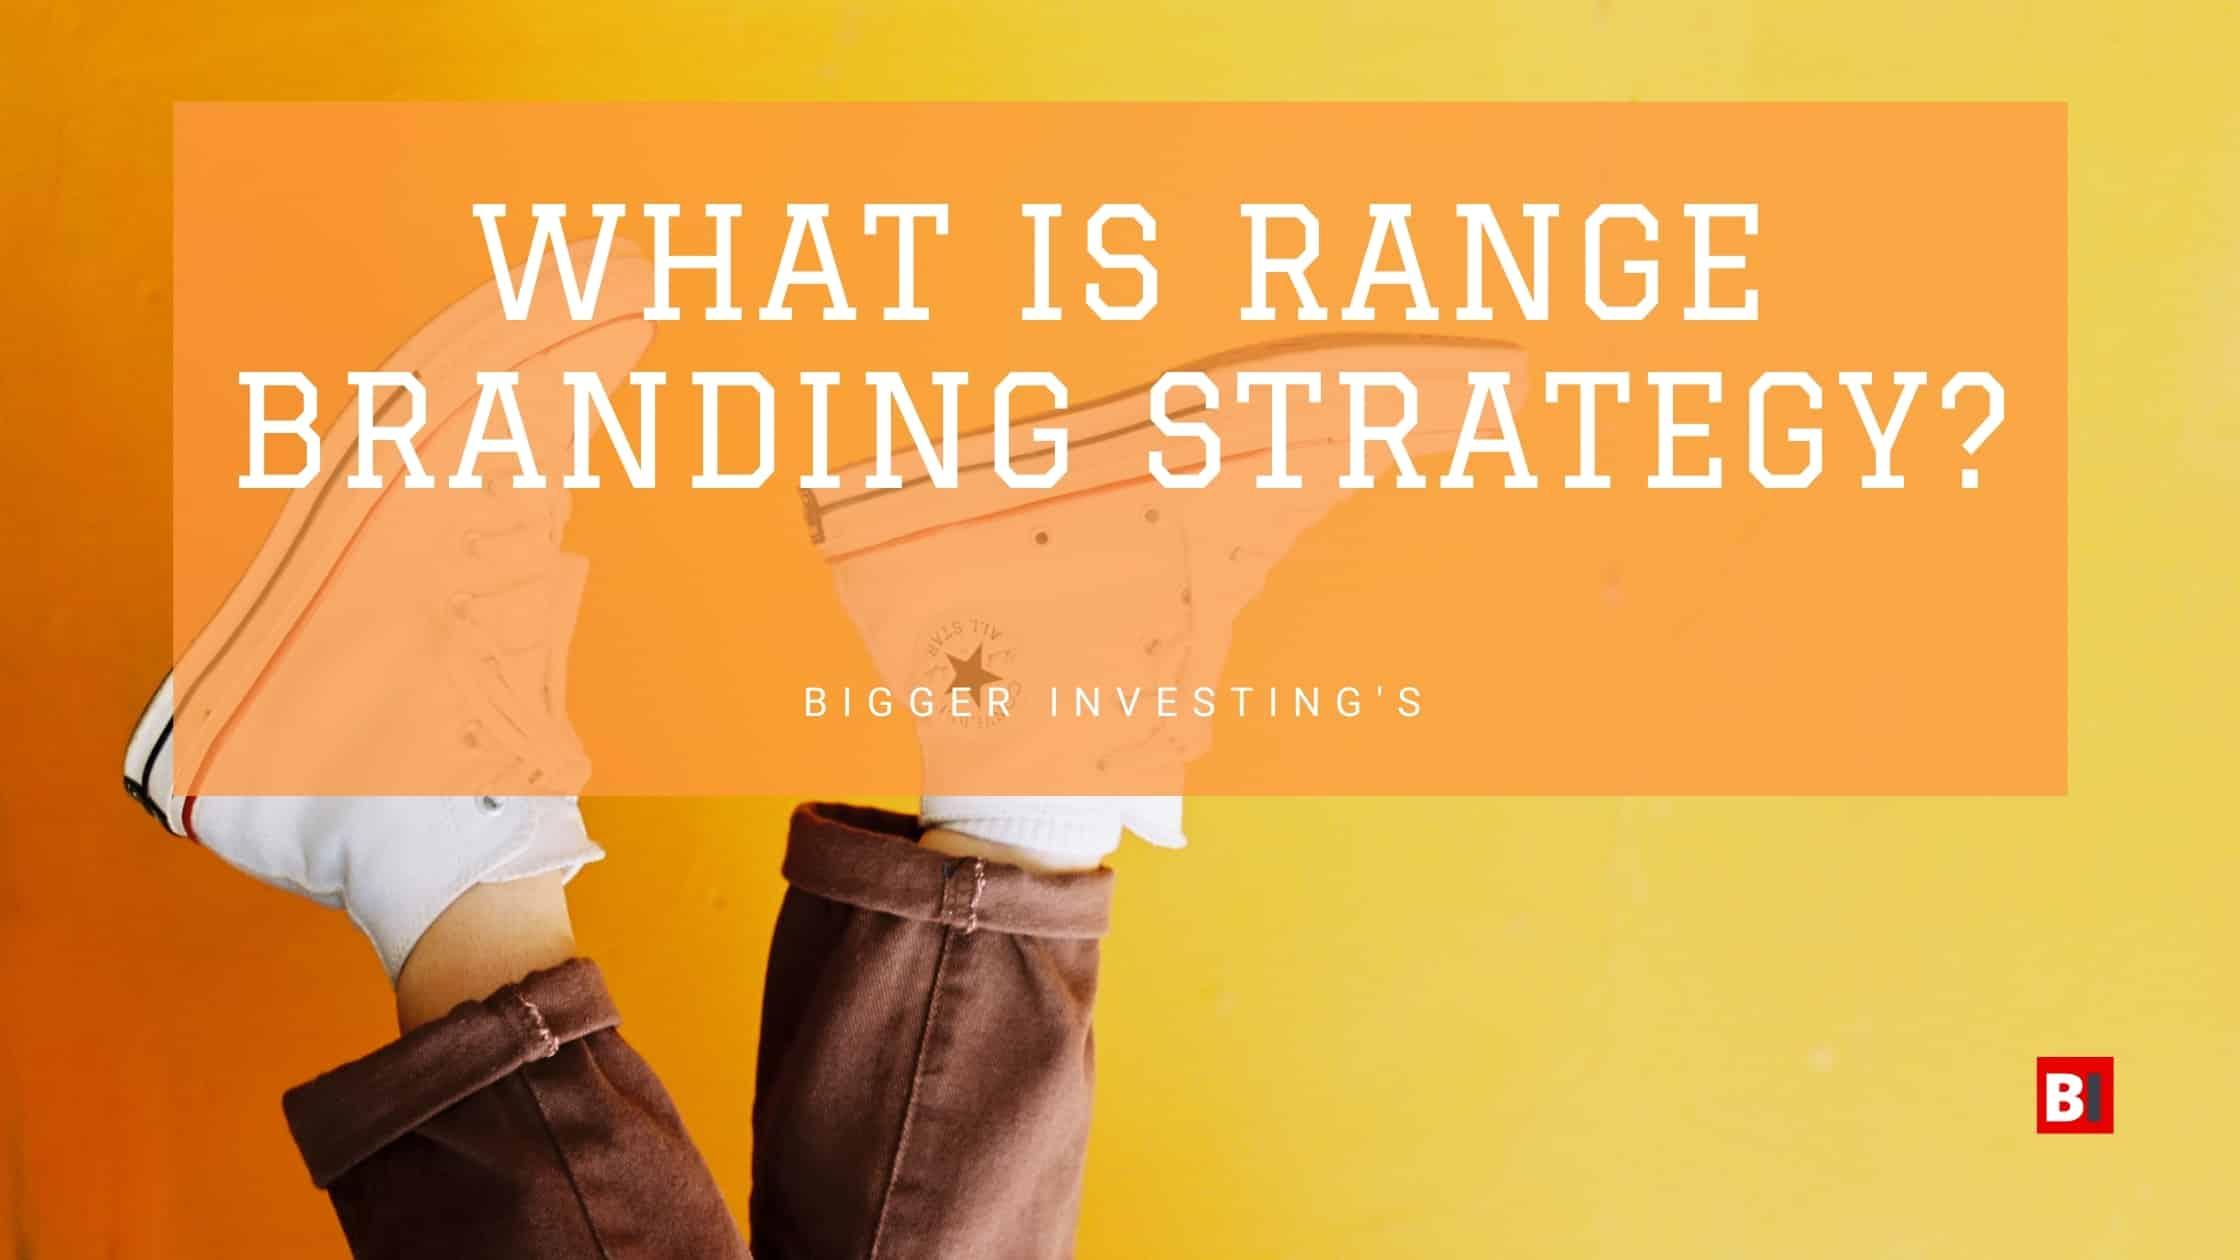 What is Range Branding Strategy?